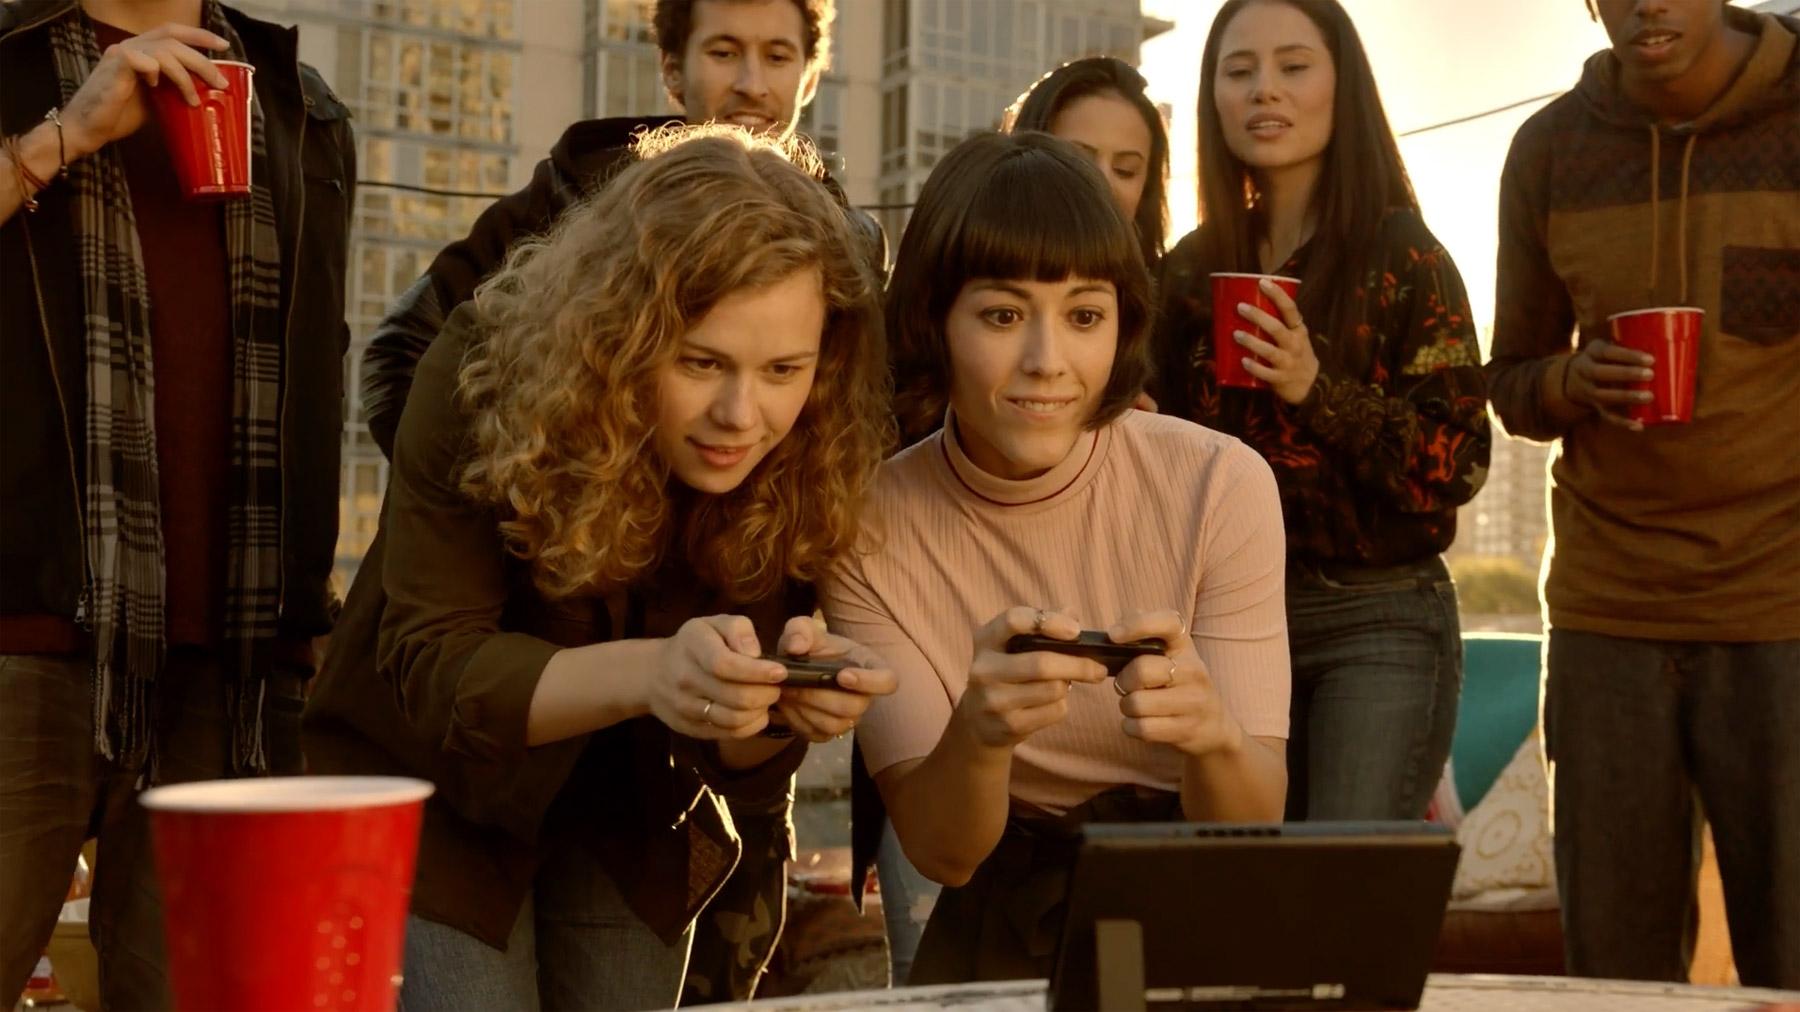 Nintendo Swap - 'Karen' playing switch on rooftop